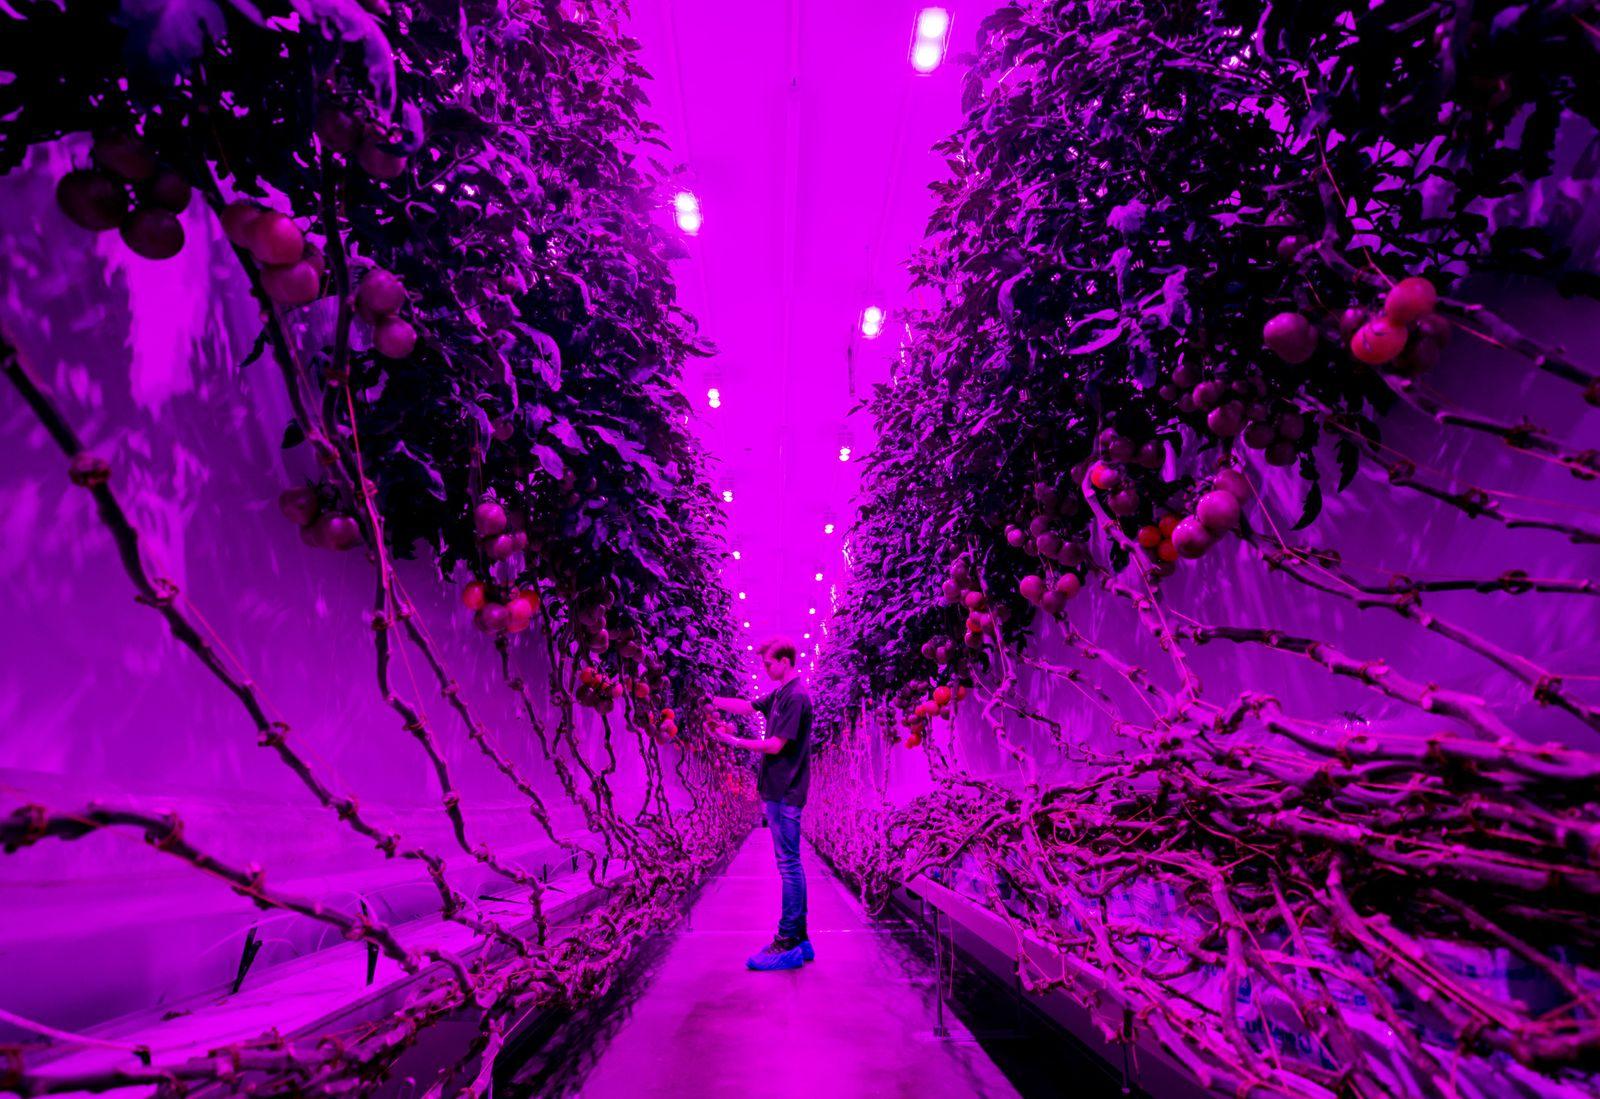 TOPSHOT-NETHERLANDS-AGRICULTURE-TECHNOLOGY